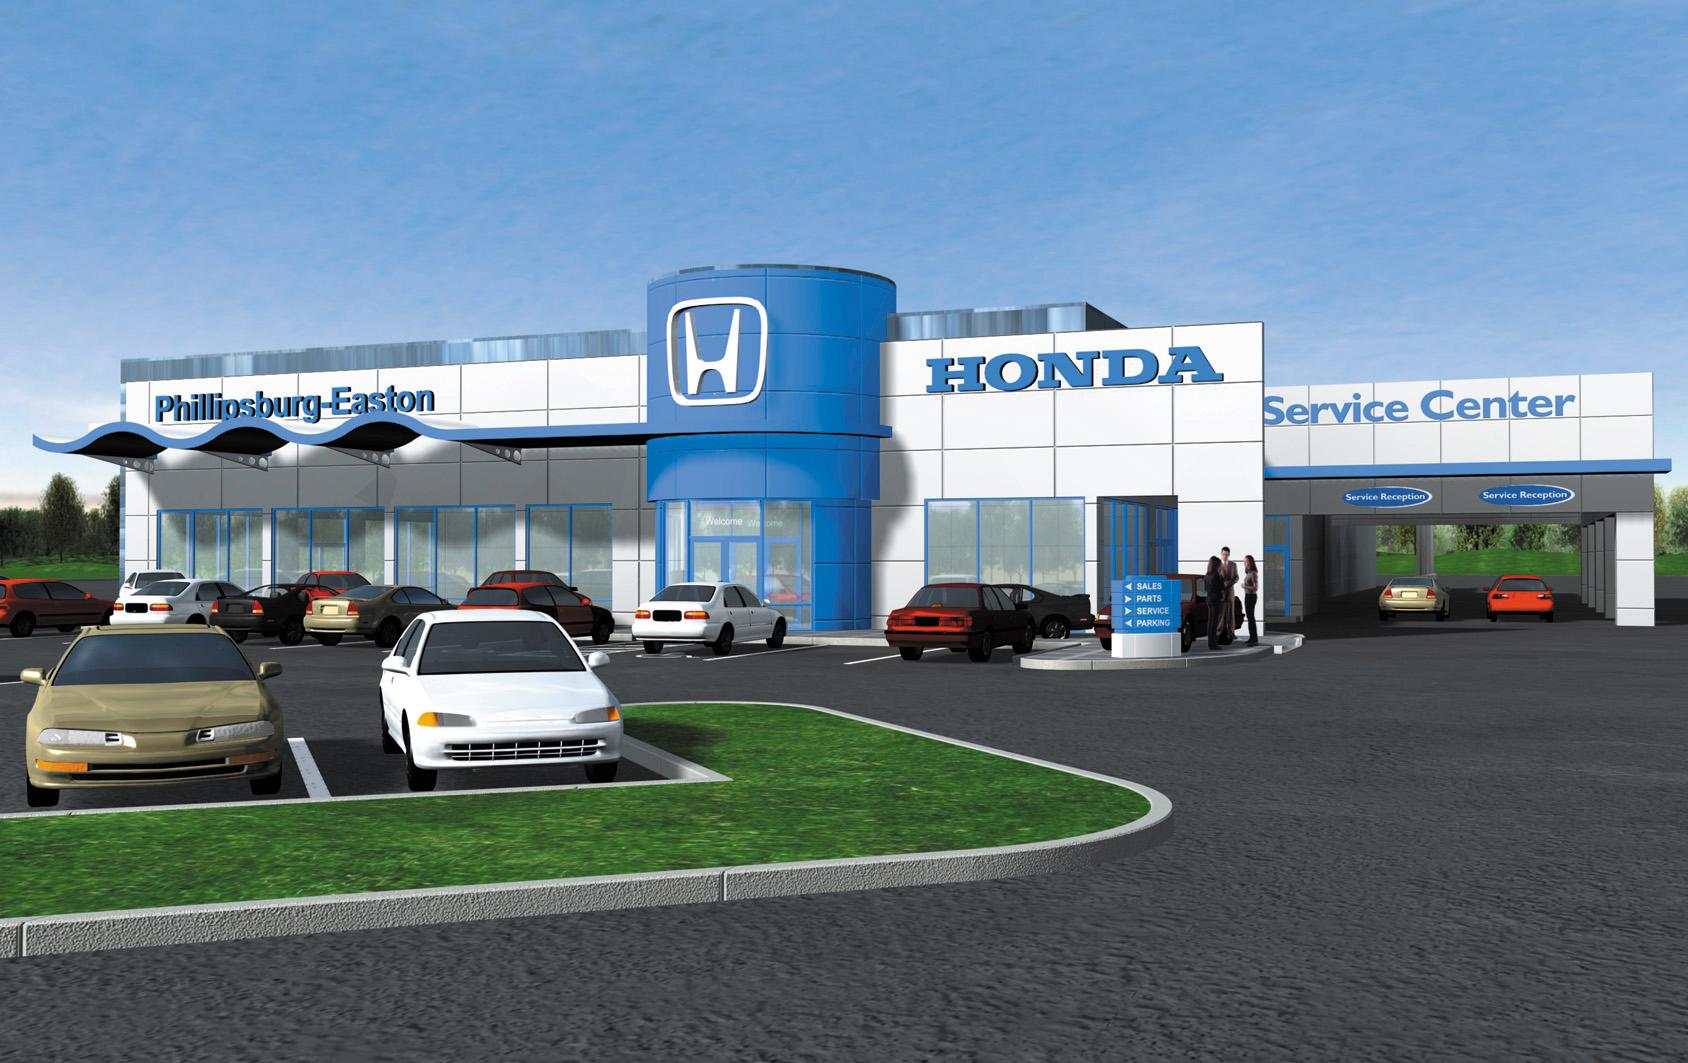 new car dealership press releasePhillipsburg Easton Honda to Complete Construction of New Dealership